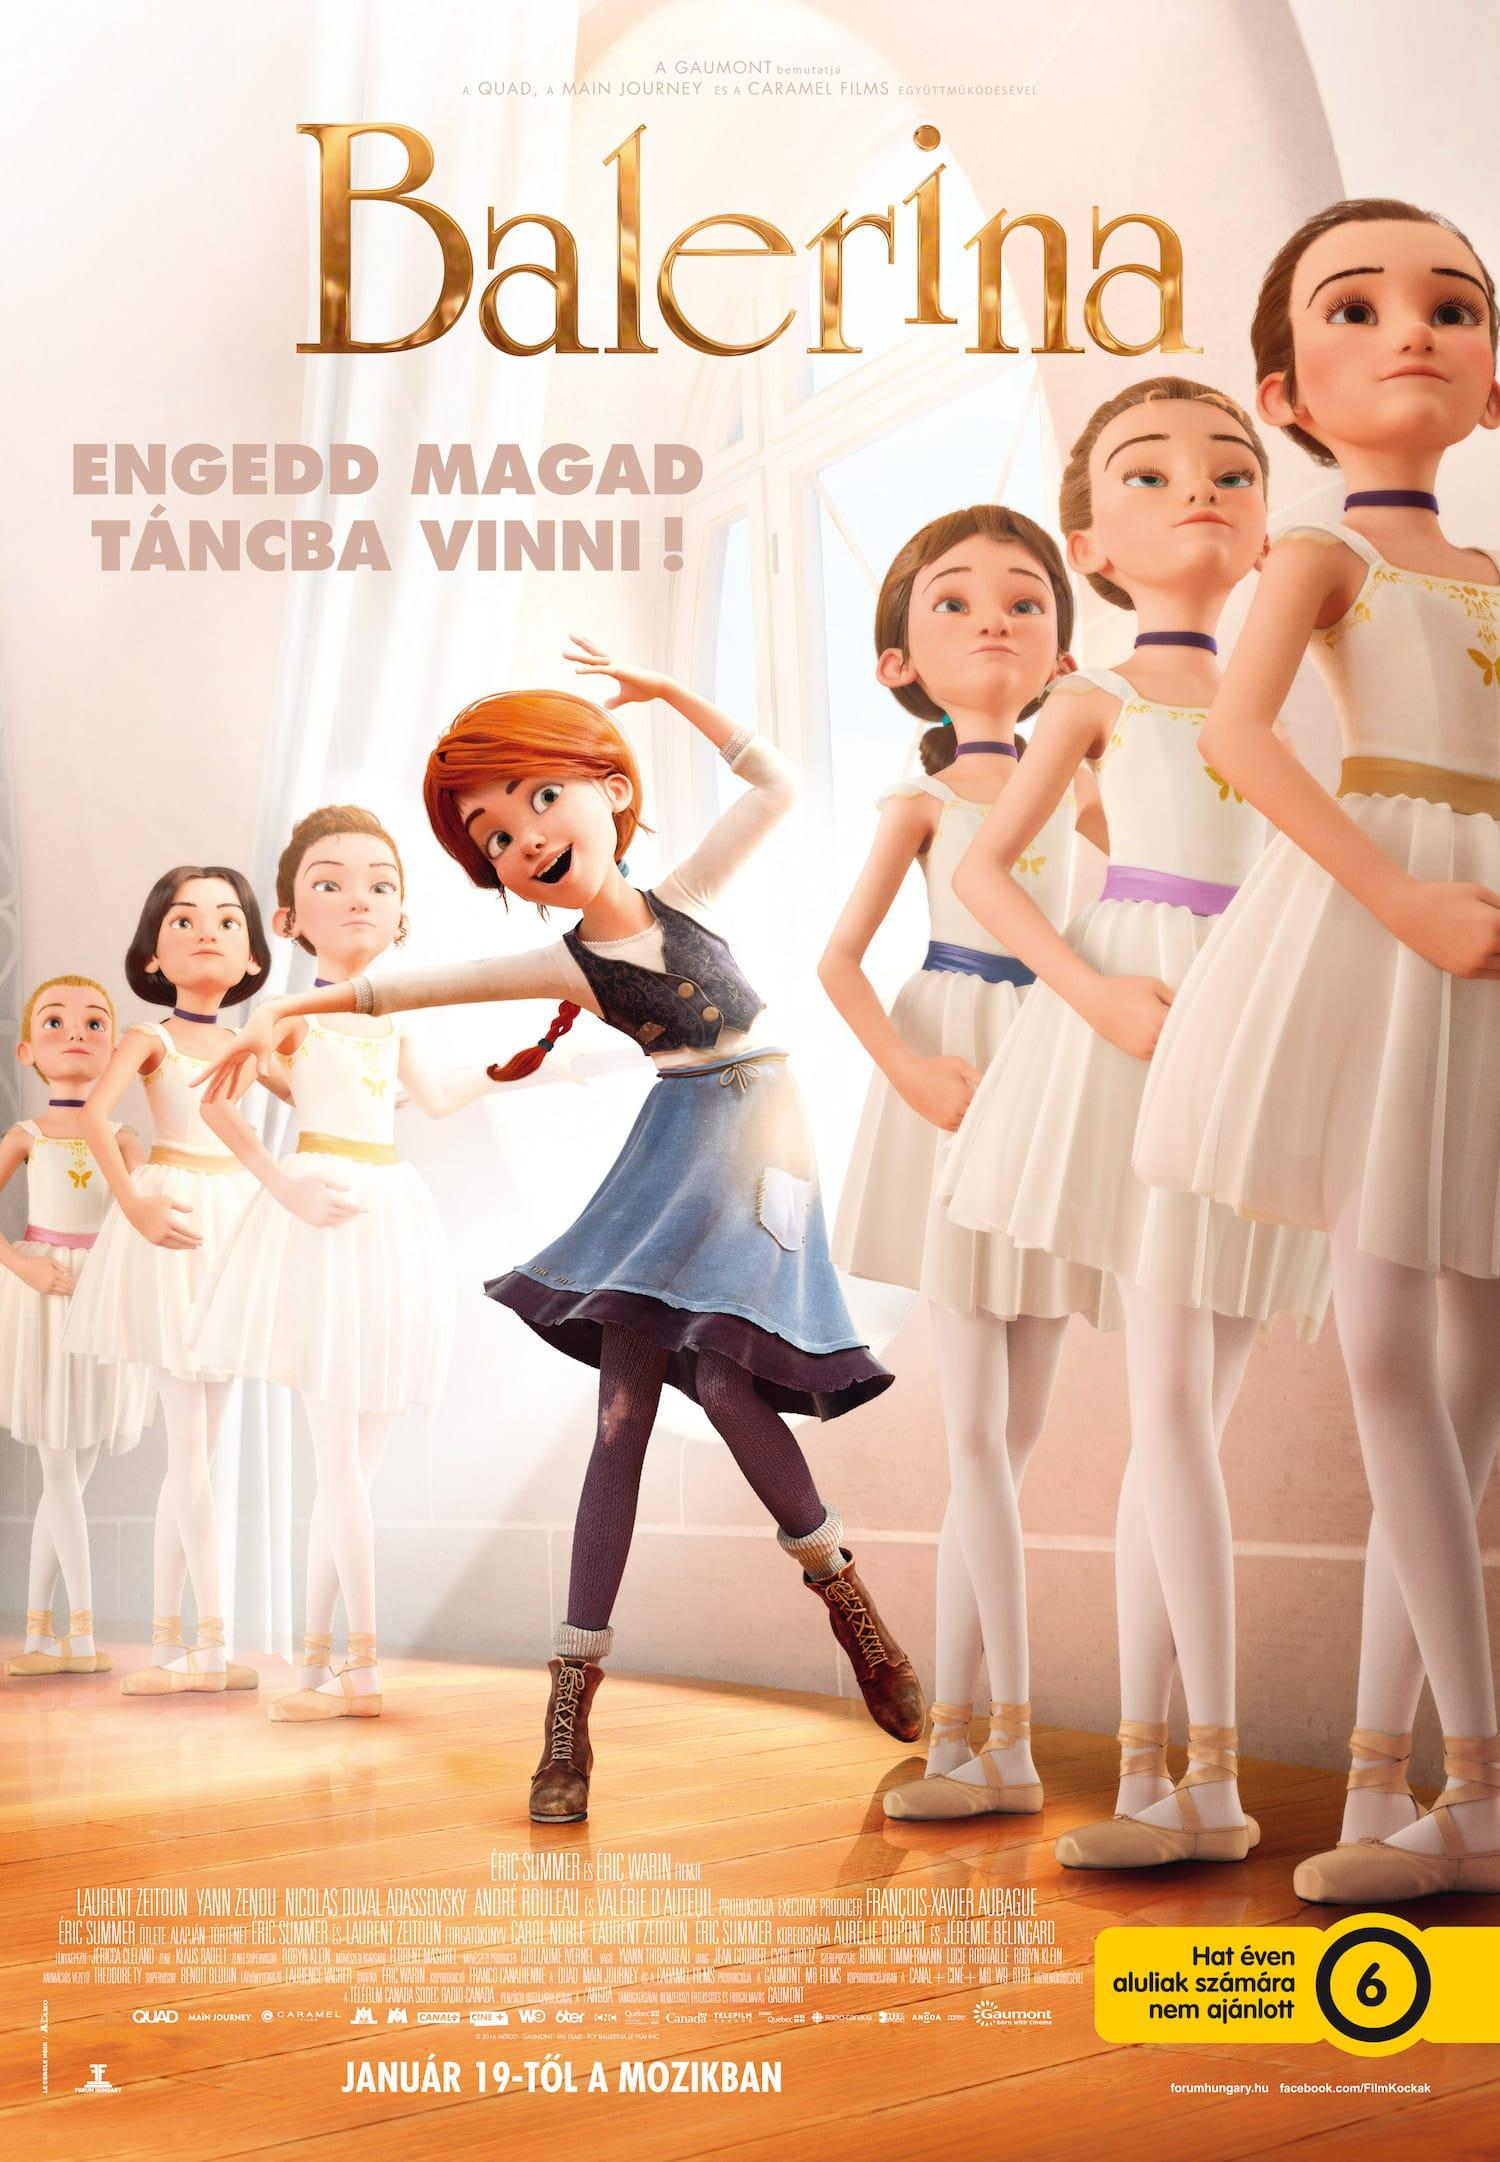 1092-balerina_15482.jpg